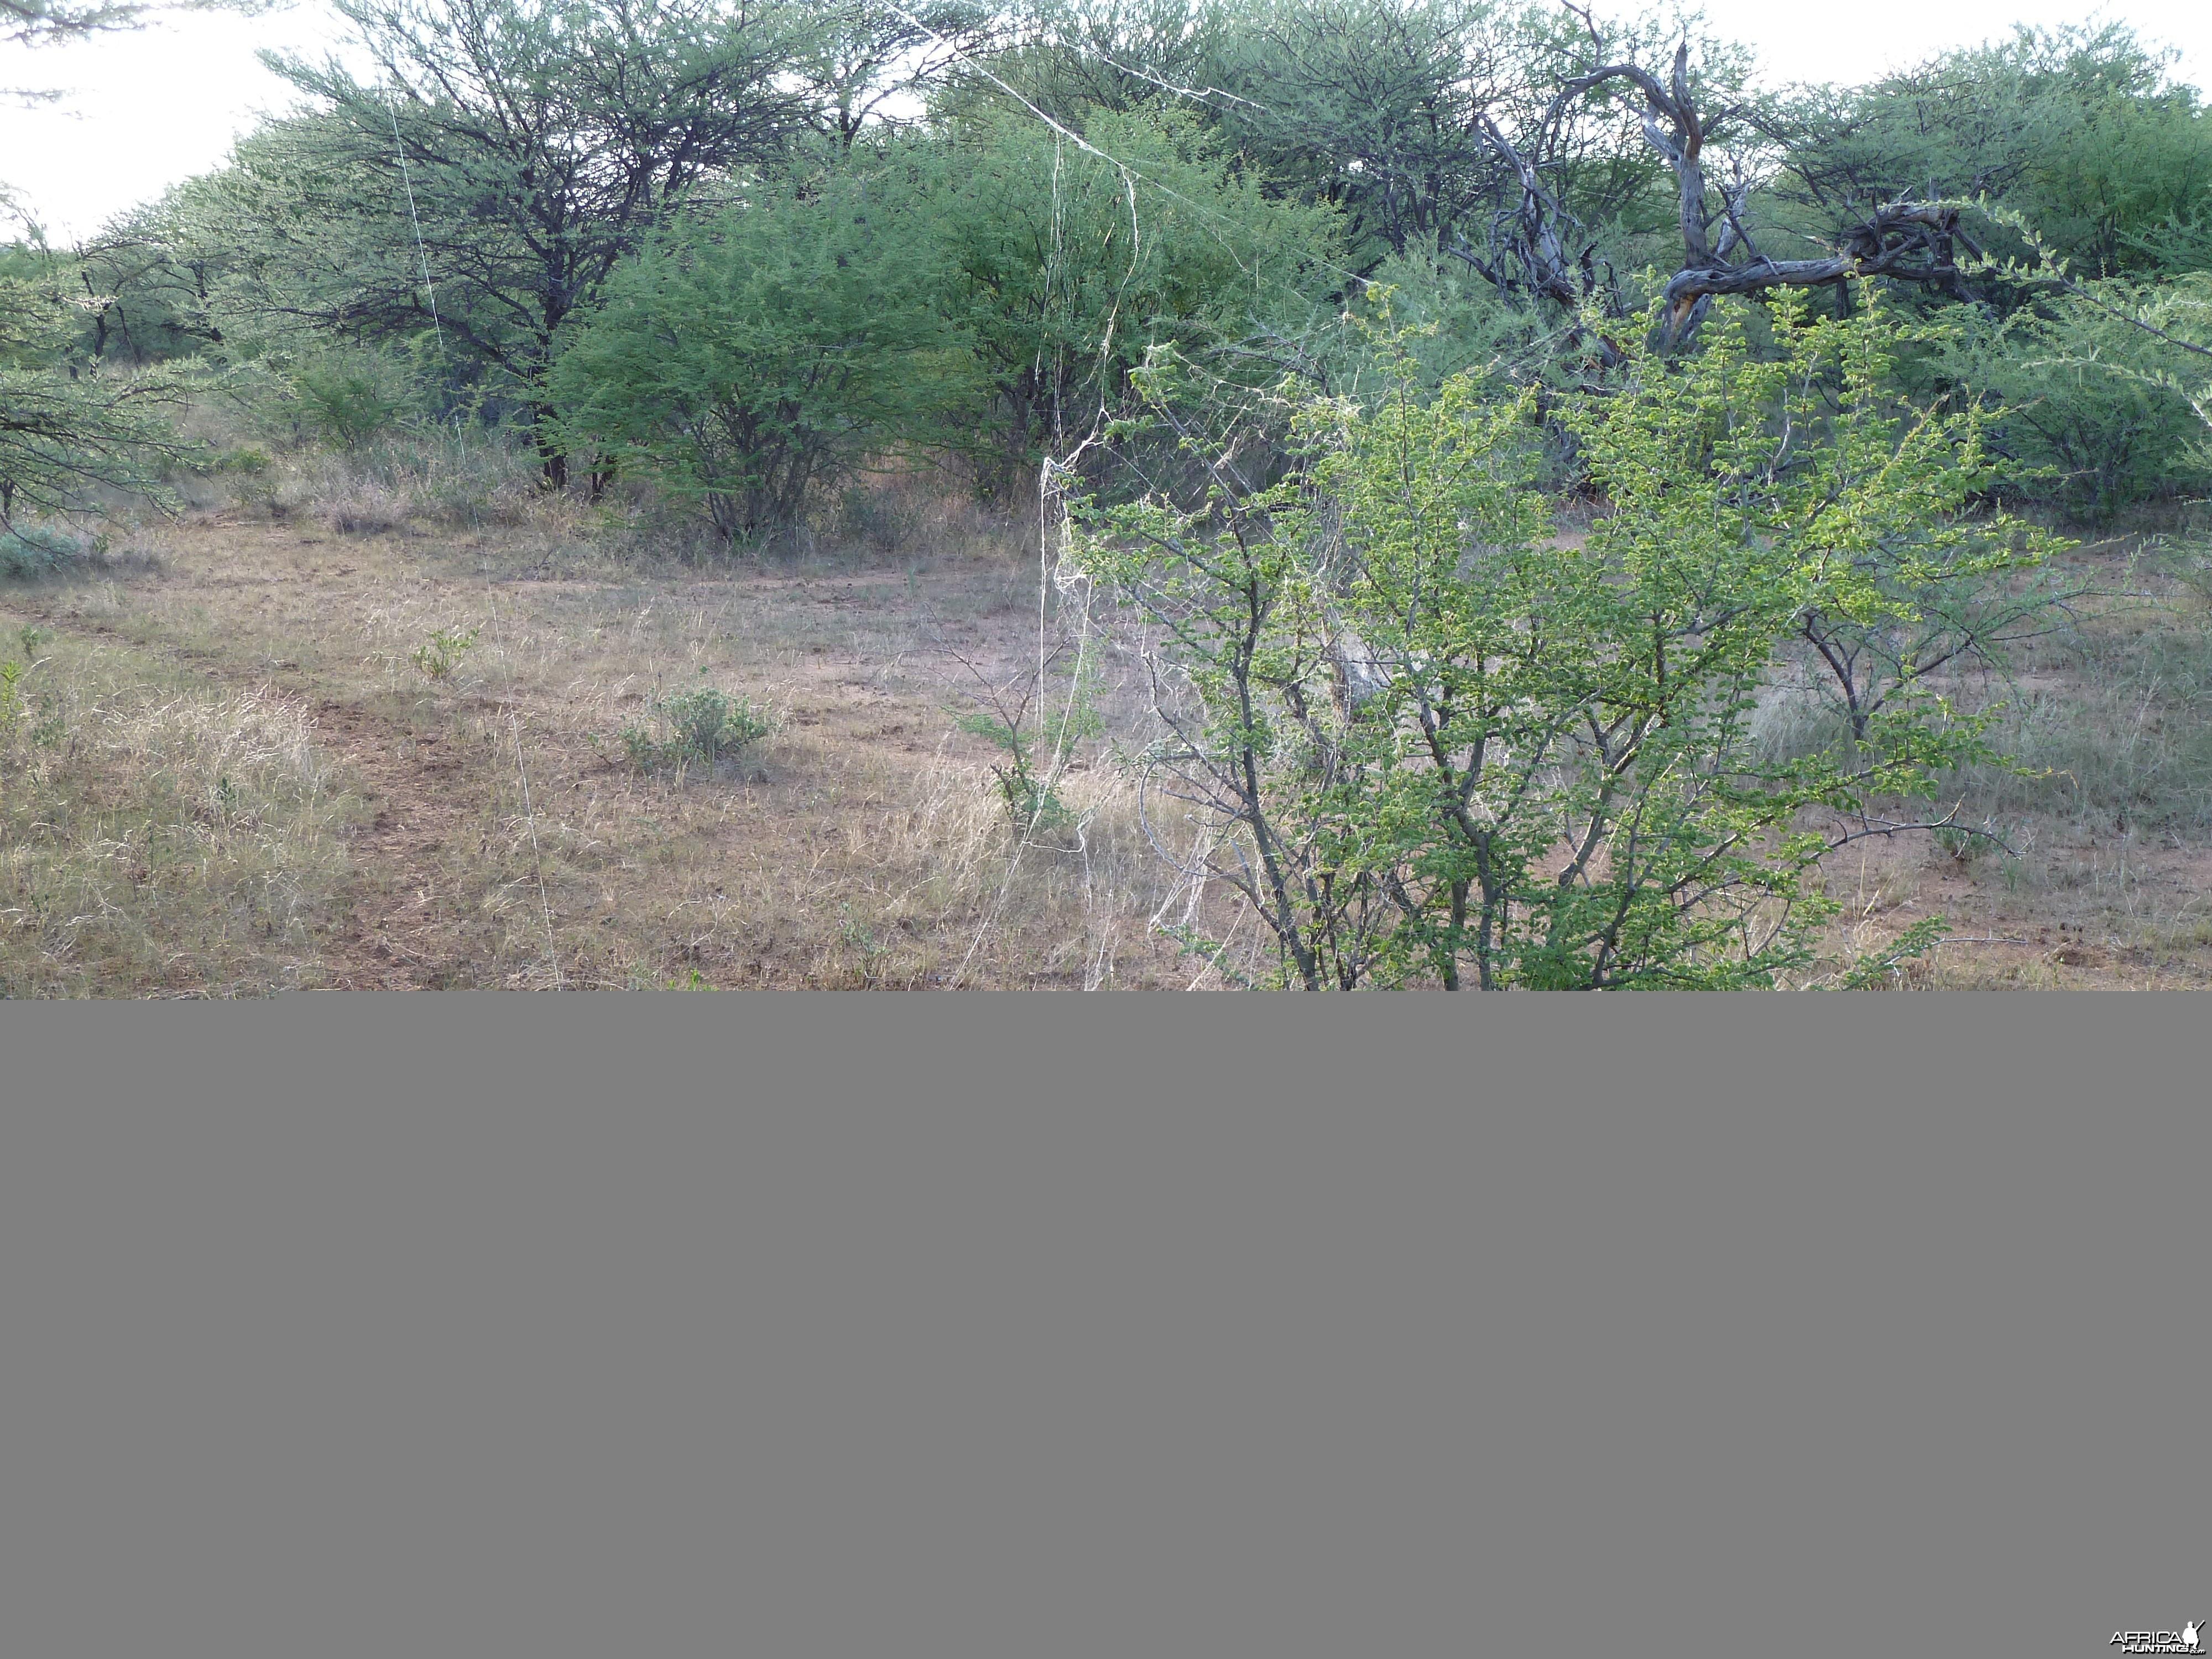 Spider Web Namibia